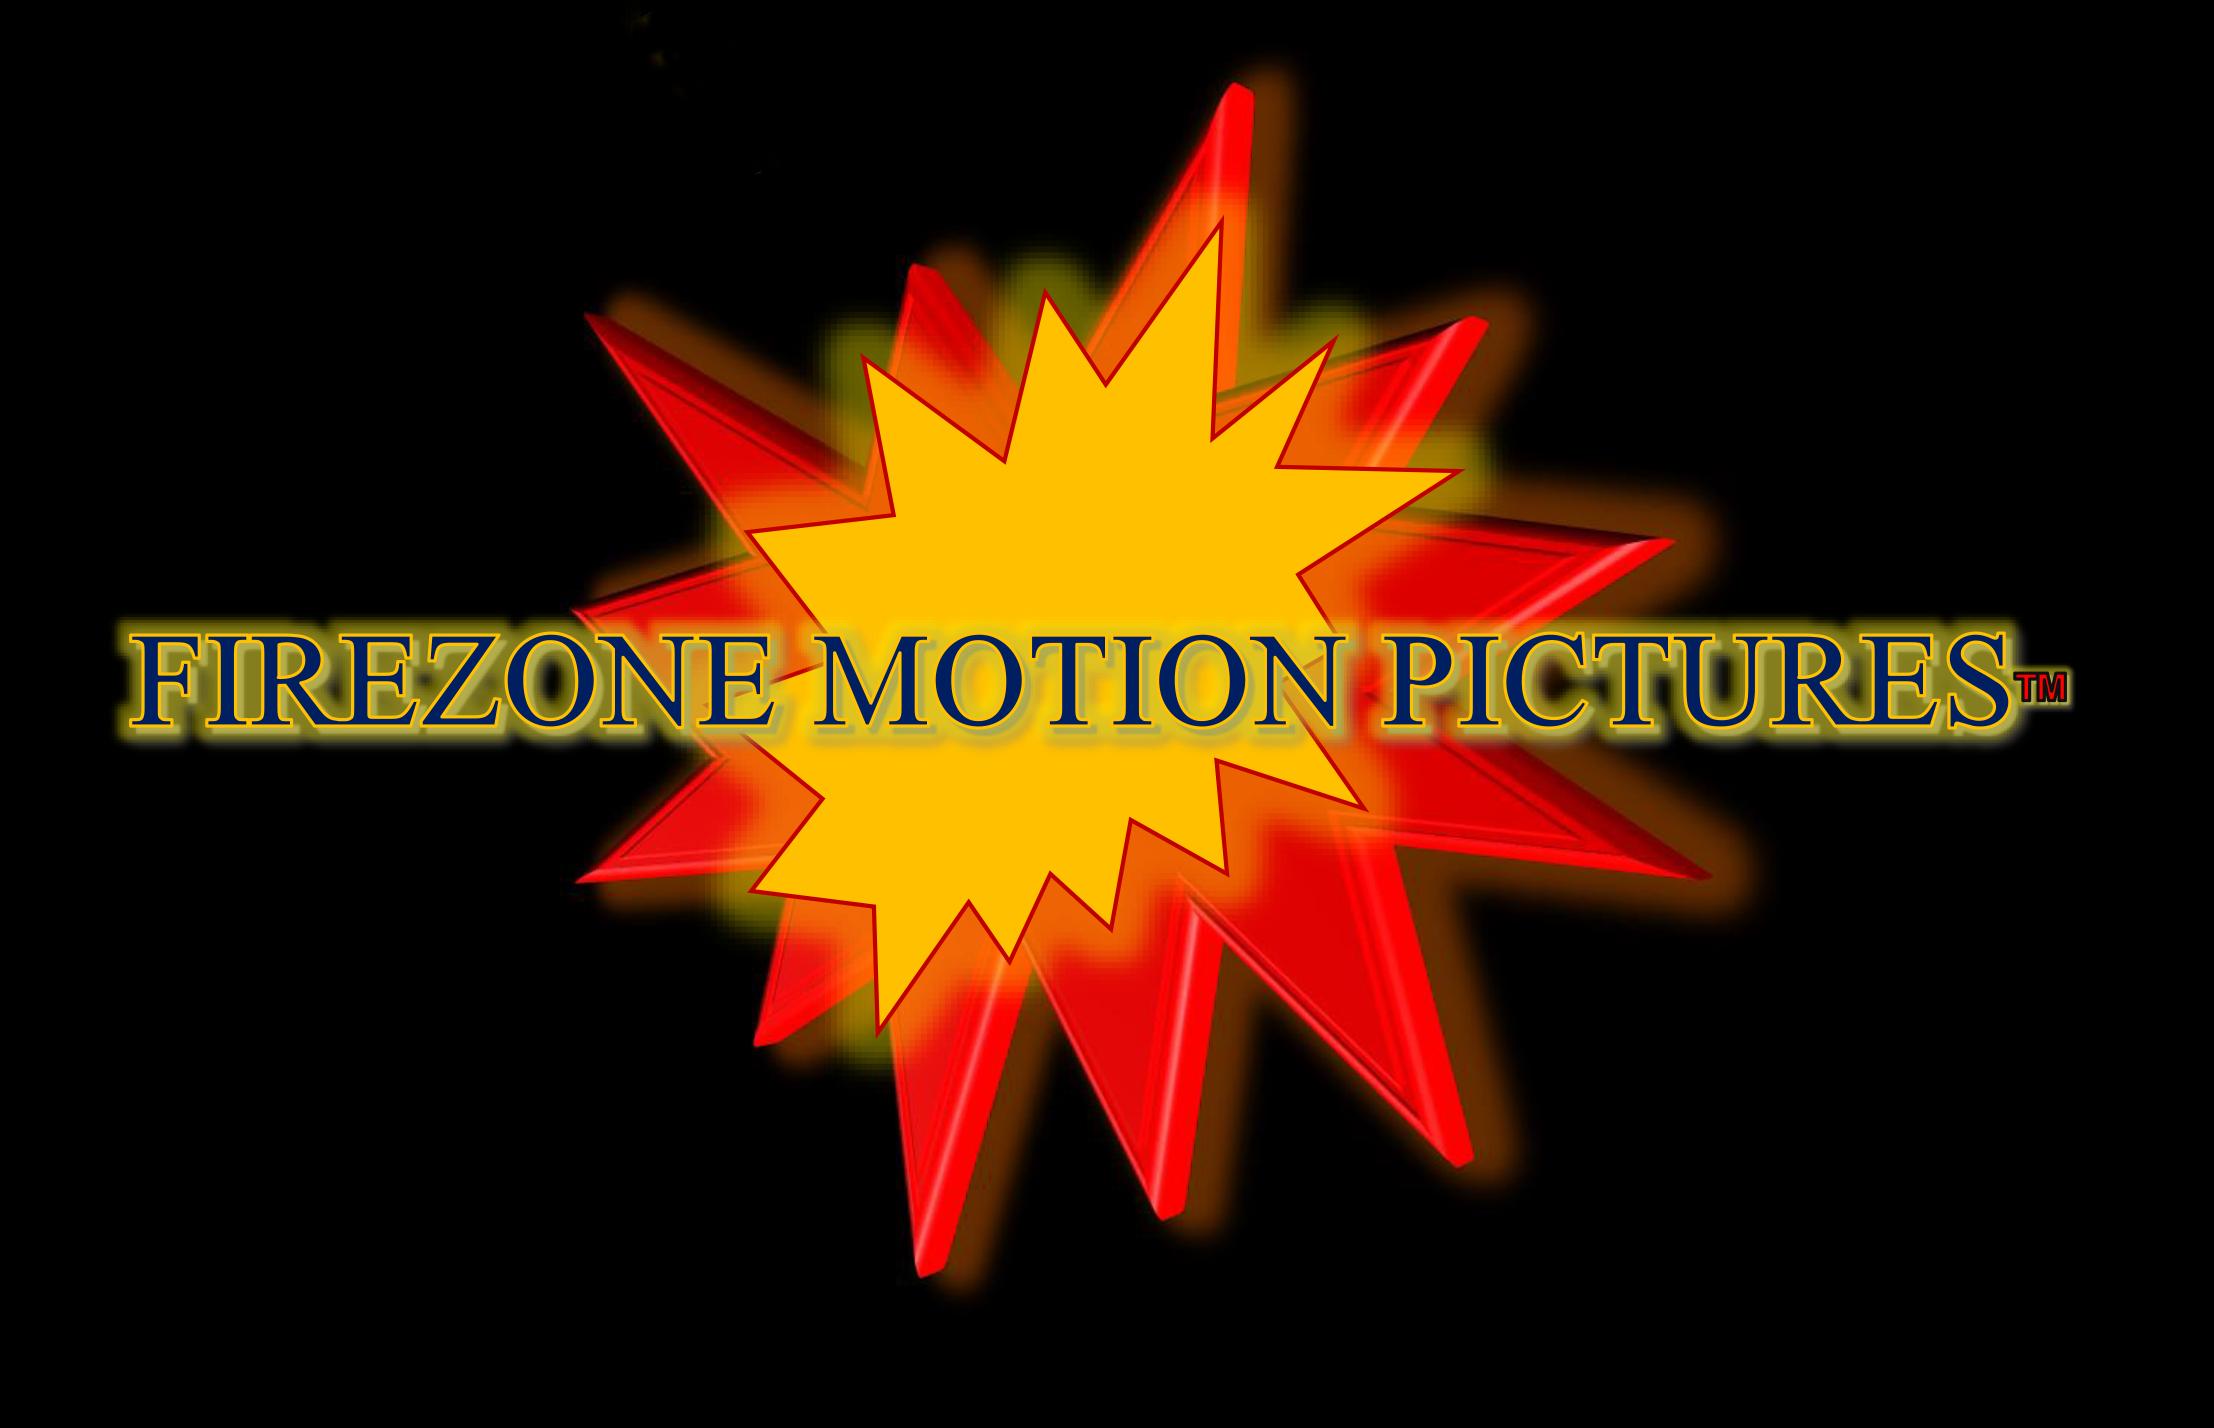 Firezone MP Logo Without Match